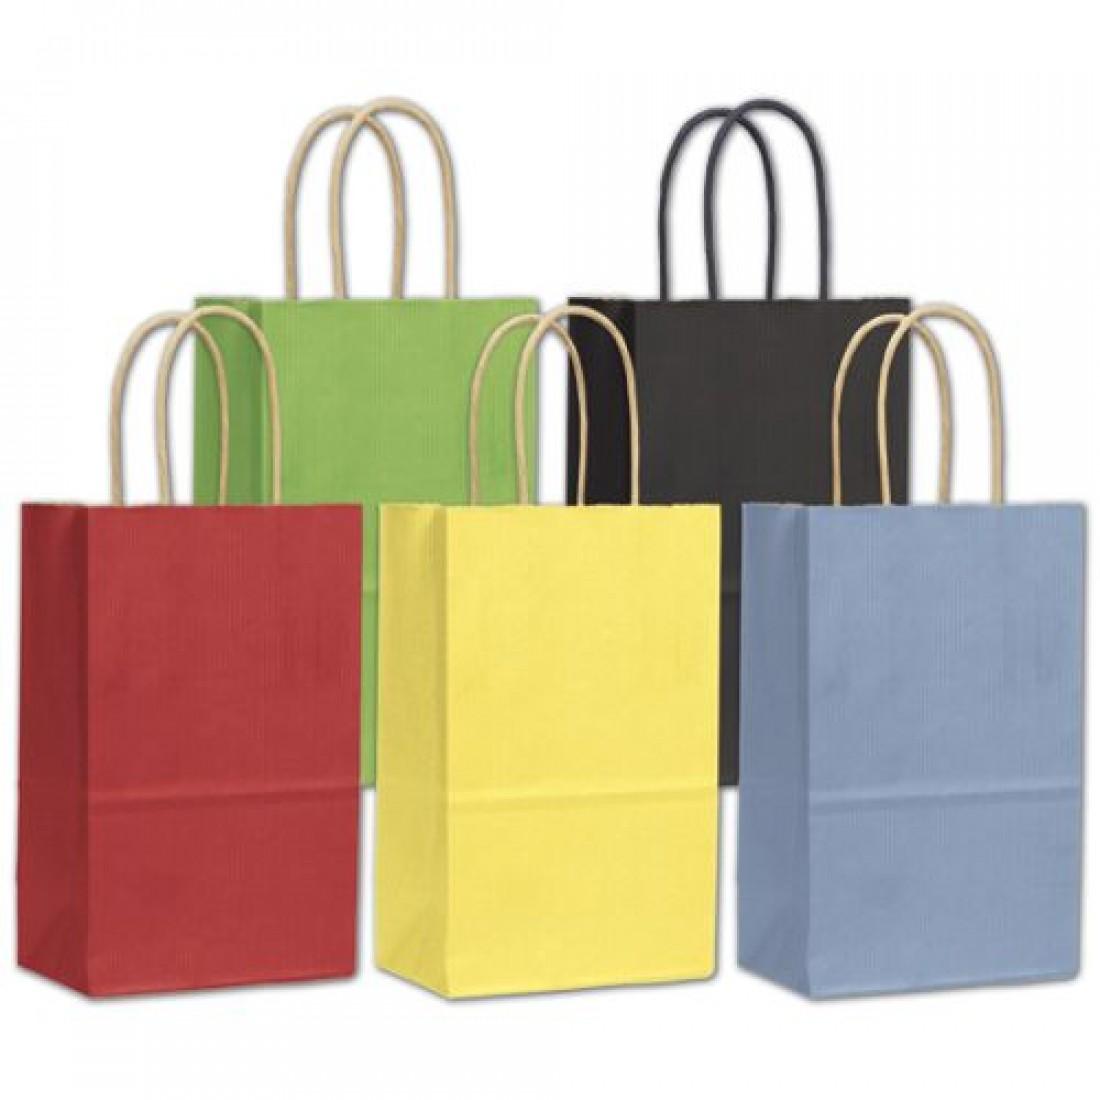 Varn Strp Bag, 5.25x3.5x8.25